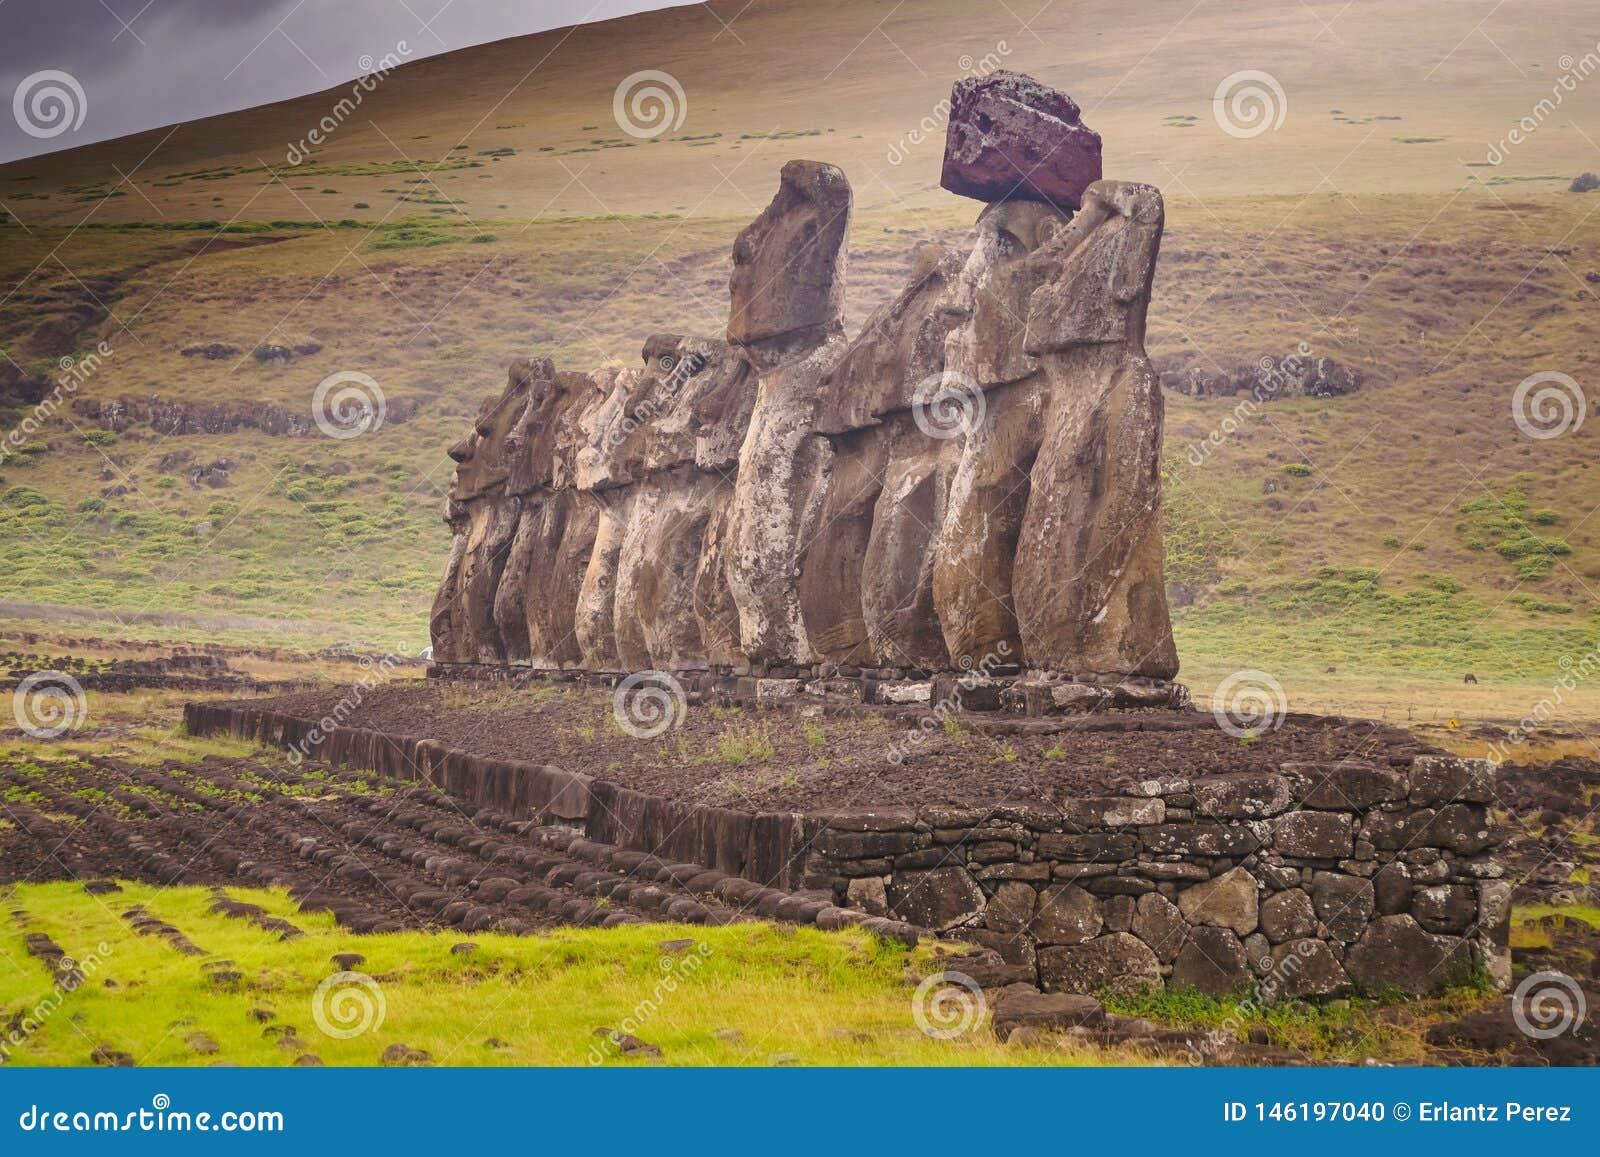 The 15 Moai Statues In Ahu Tongariki, Easter Island, Chile